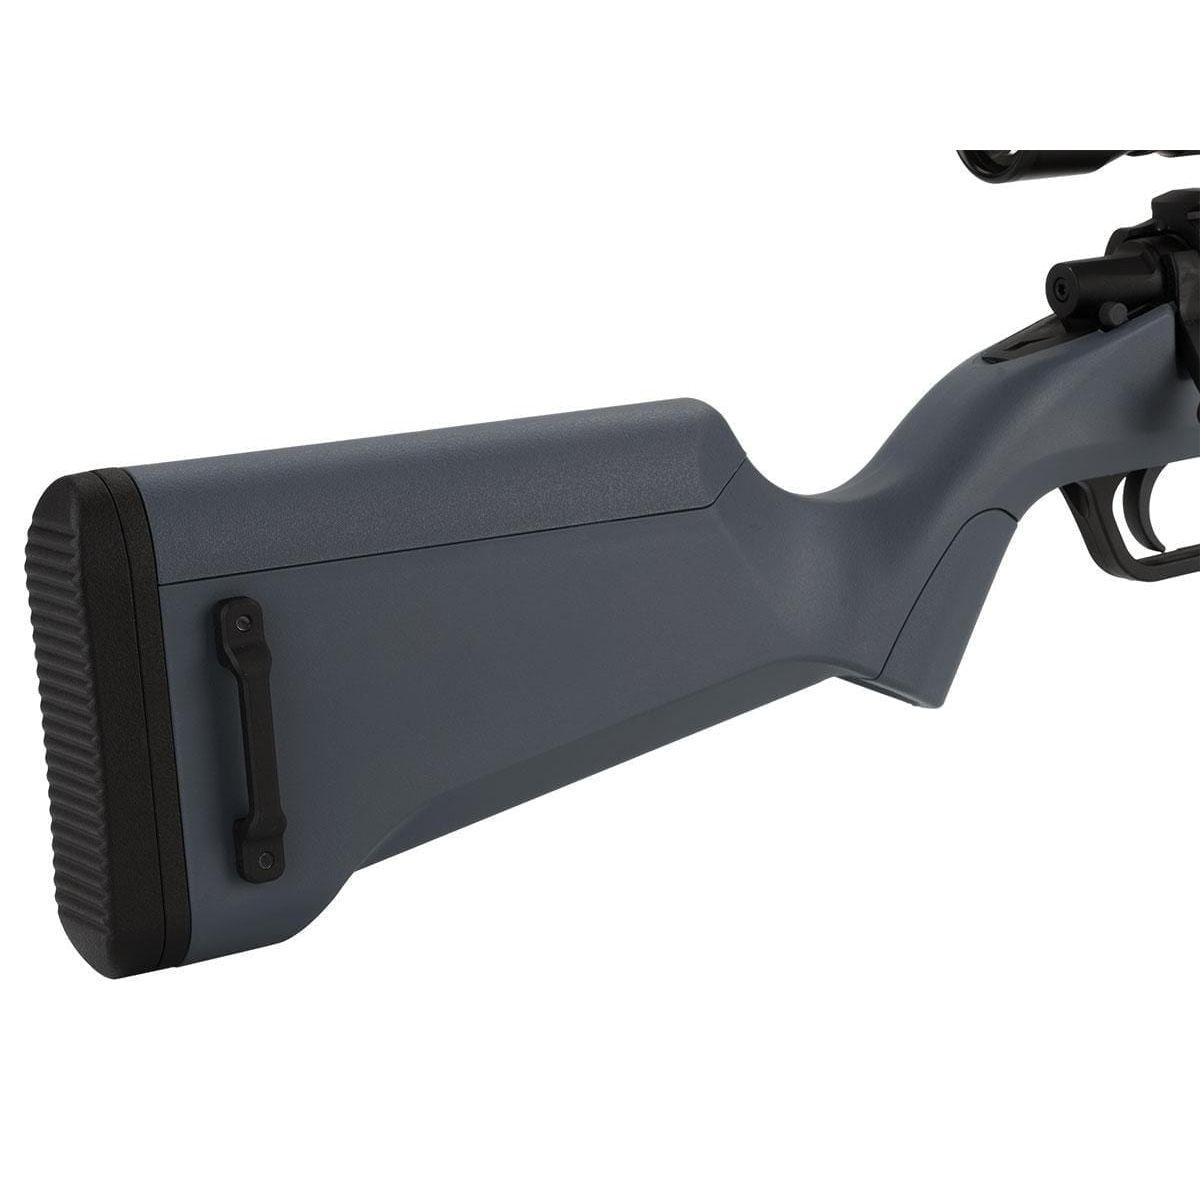 S1 Gen2 Bolt Action Sniper Rifle Urban Grey